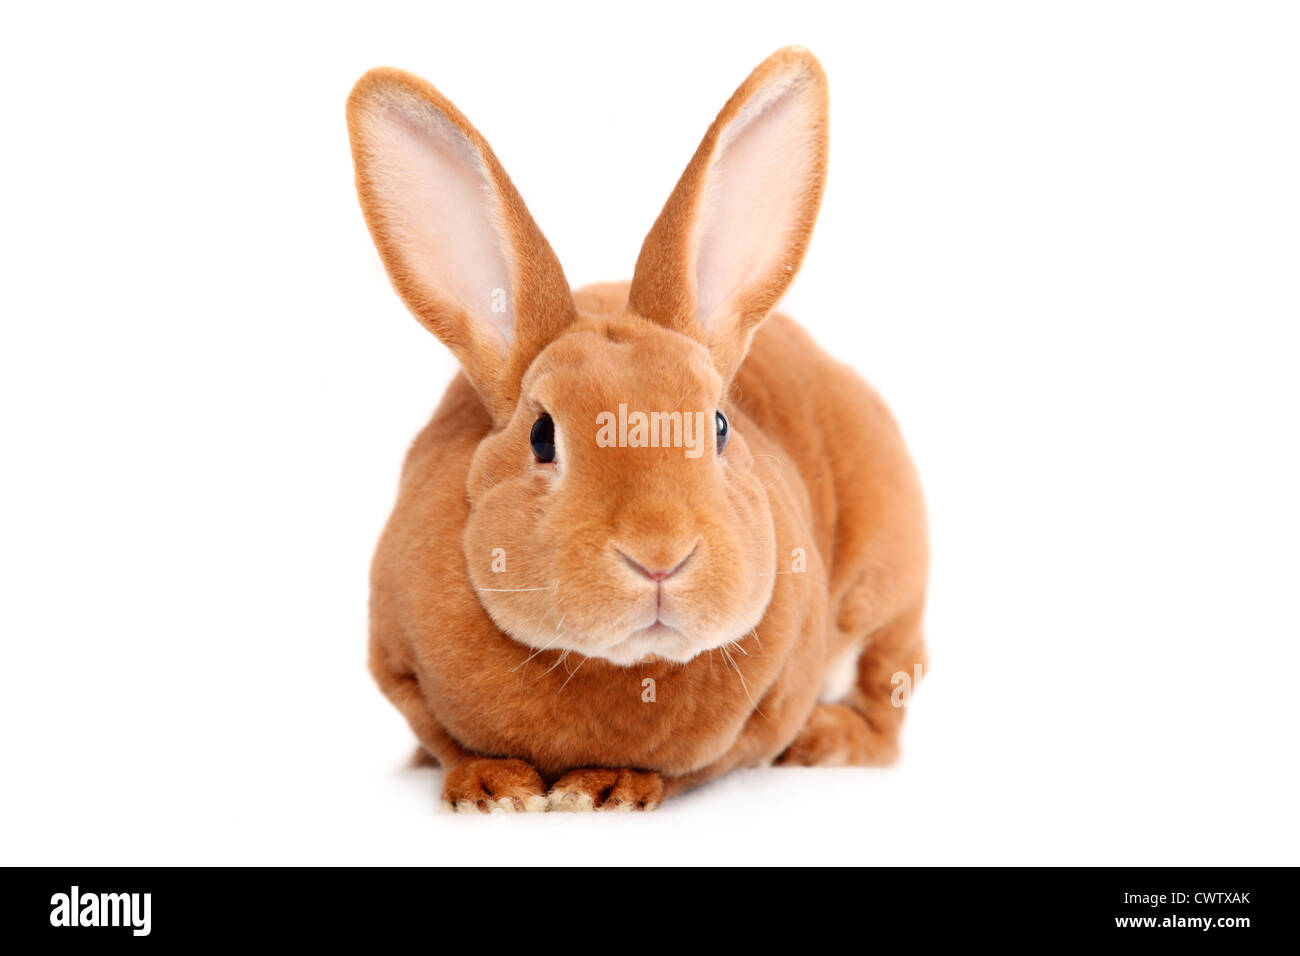 Kleinrex / Rex Bunny - Stock Image